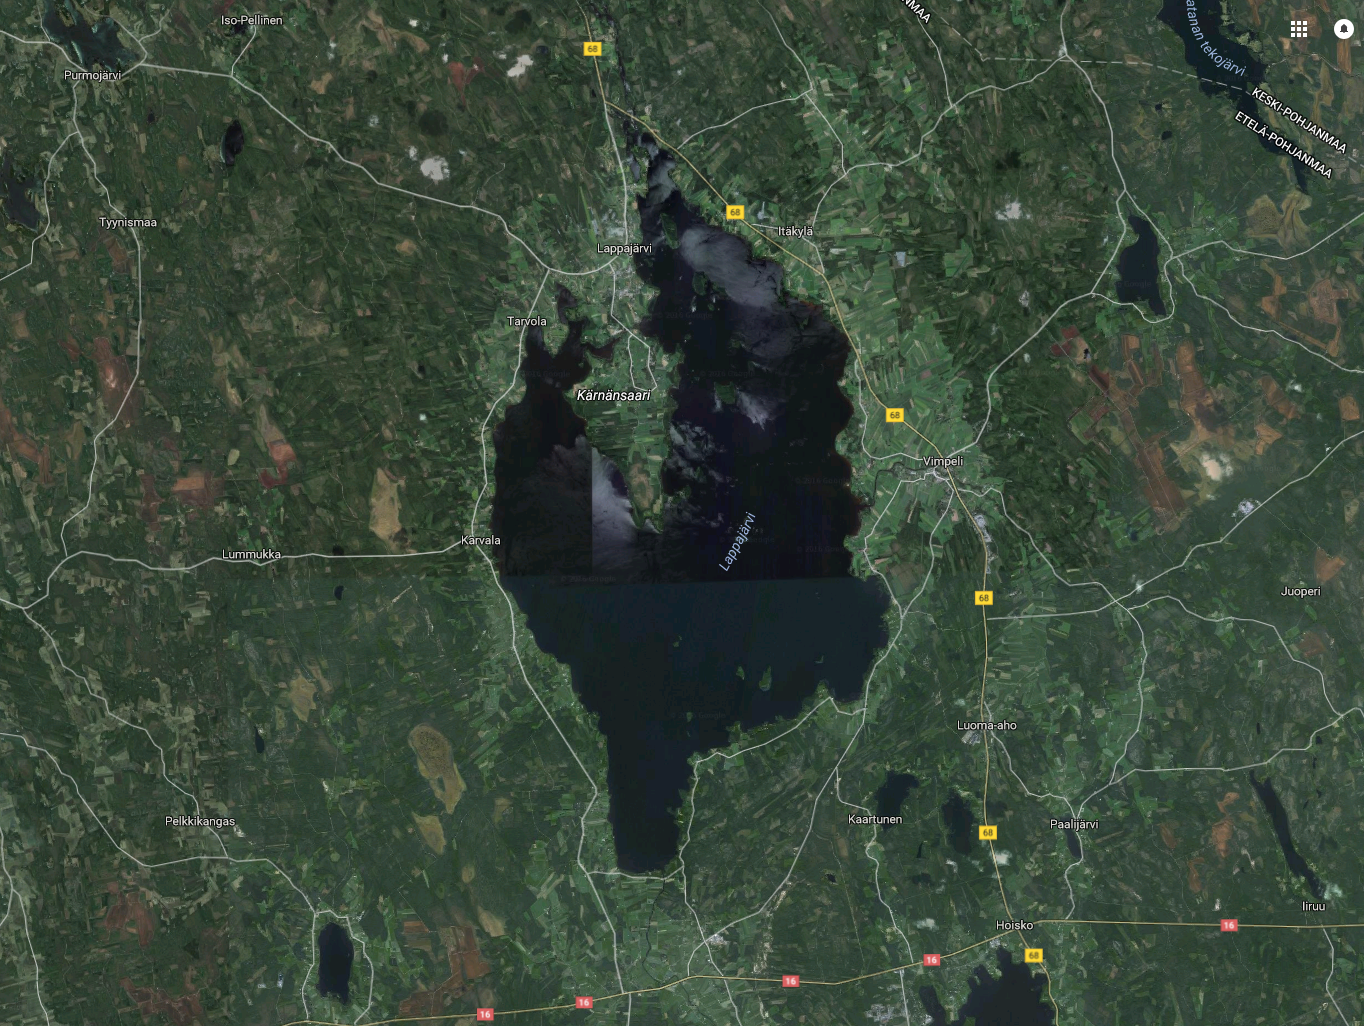 Lappajärvi is a meteorite crater. Image: Google Maps